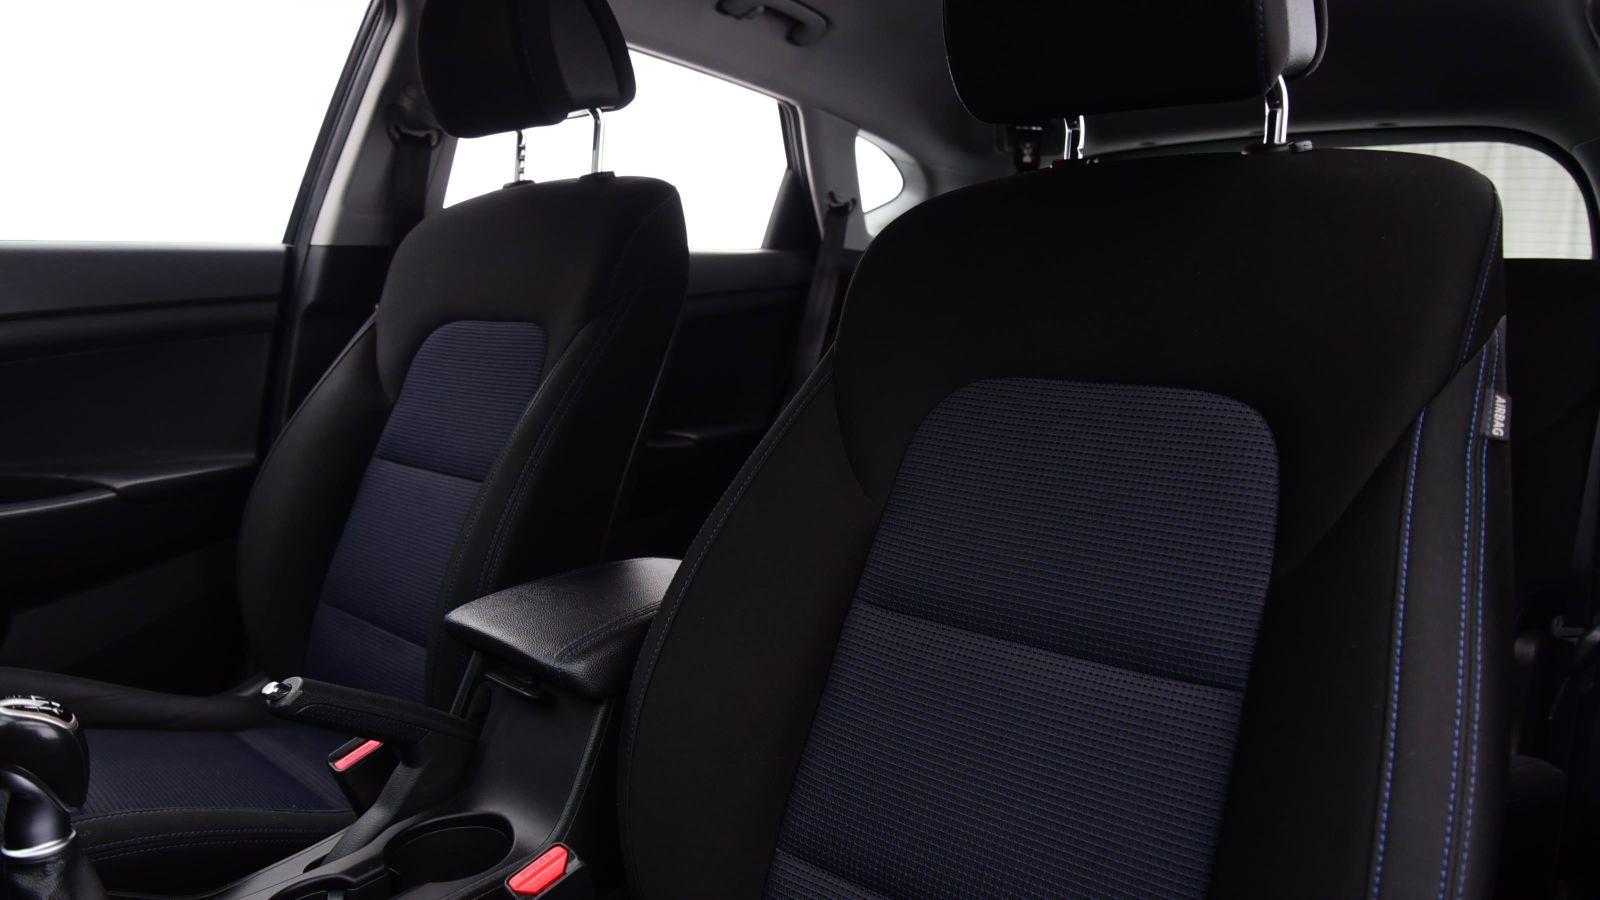 Used 16 Hyundai TUCSON 1.6 GDi Blue Drive SE Nav 5dr 2WD BLACK at Saxton4x4